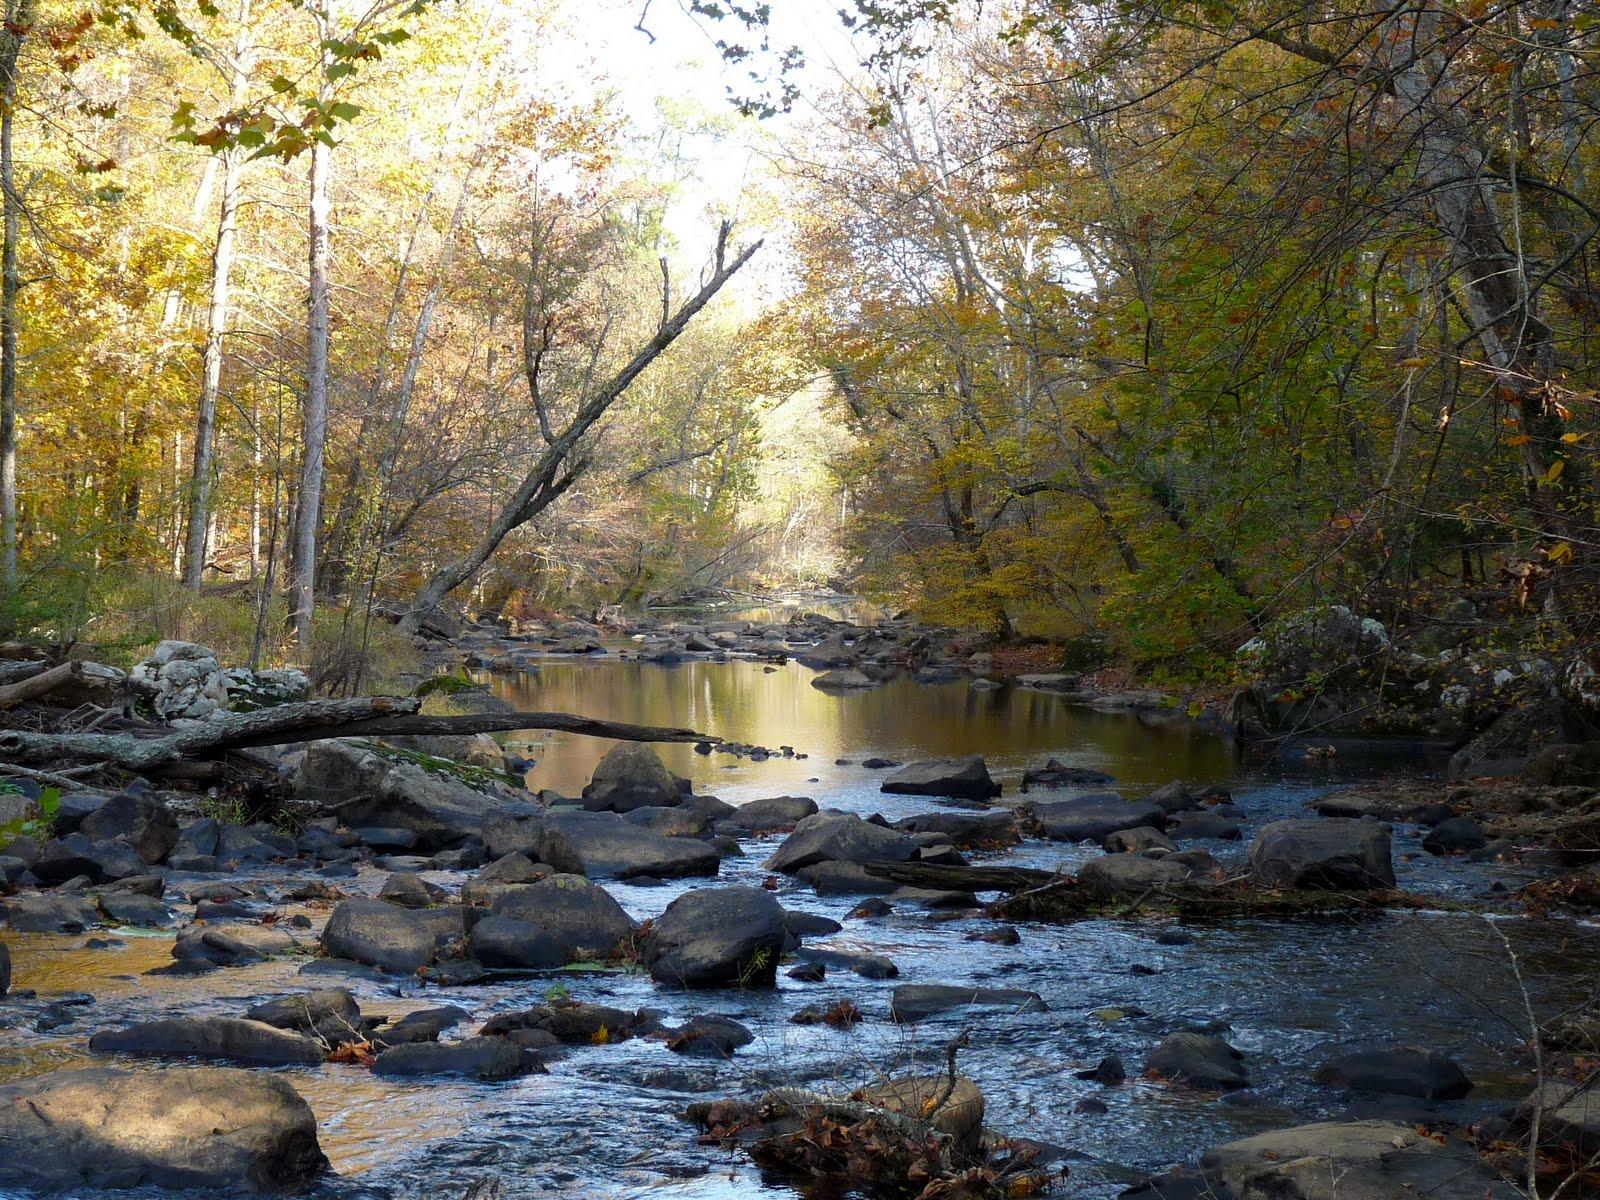 Eno River fall foliage - Em for Marvelous -